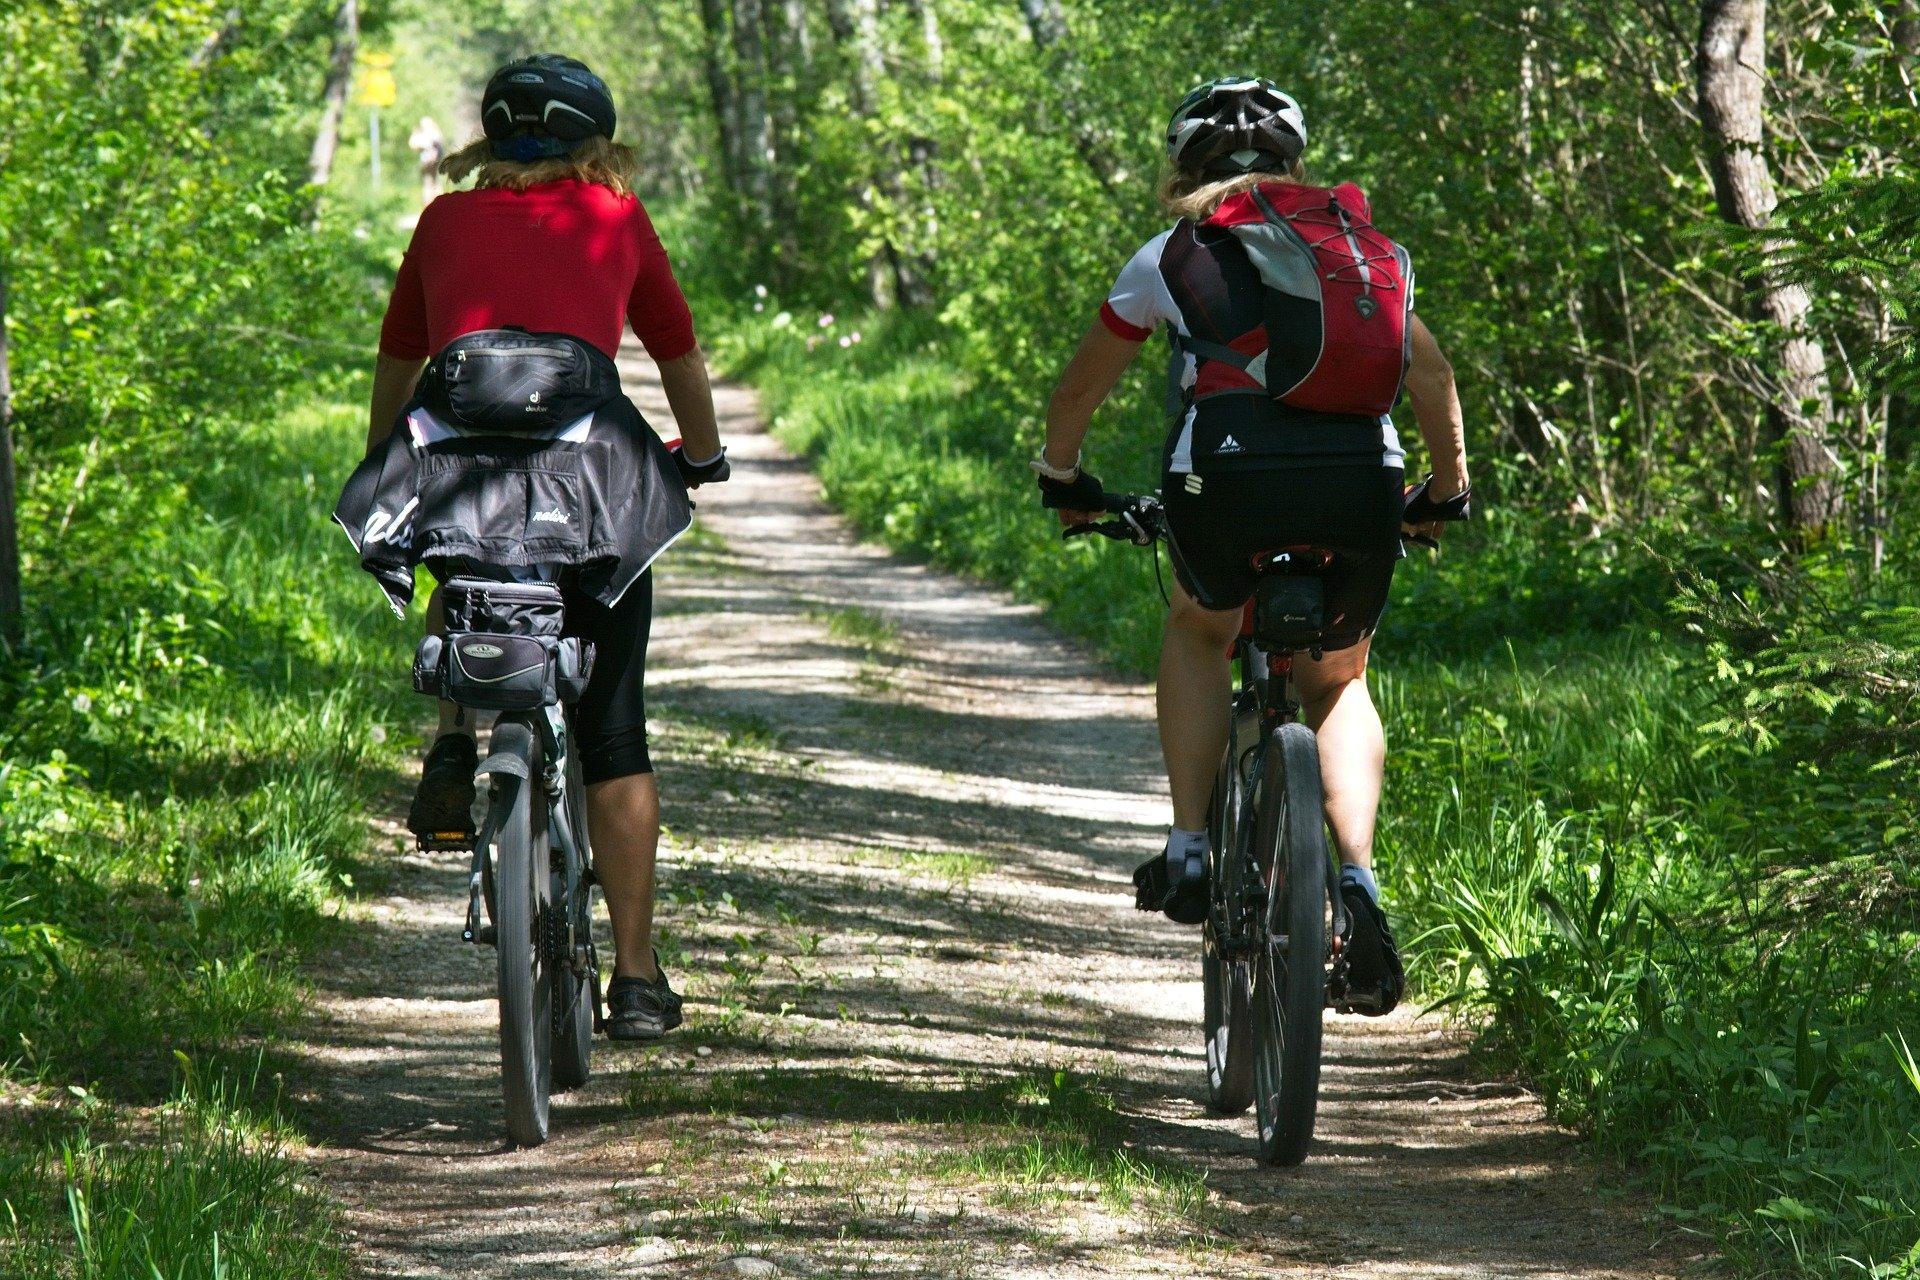 photo of 2 women riding bikes on a country lane